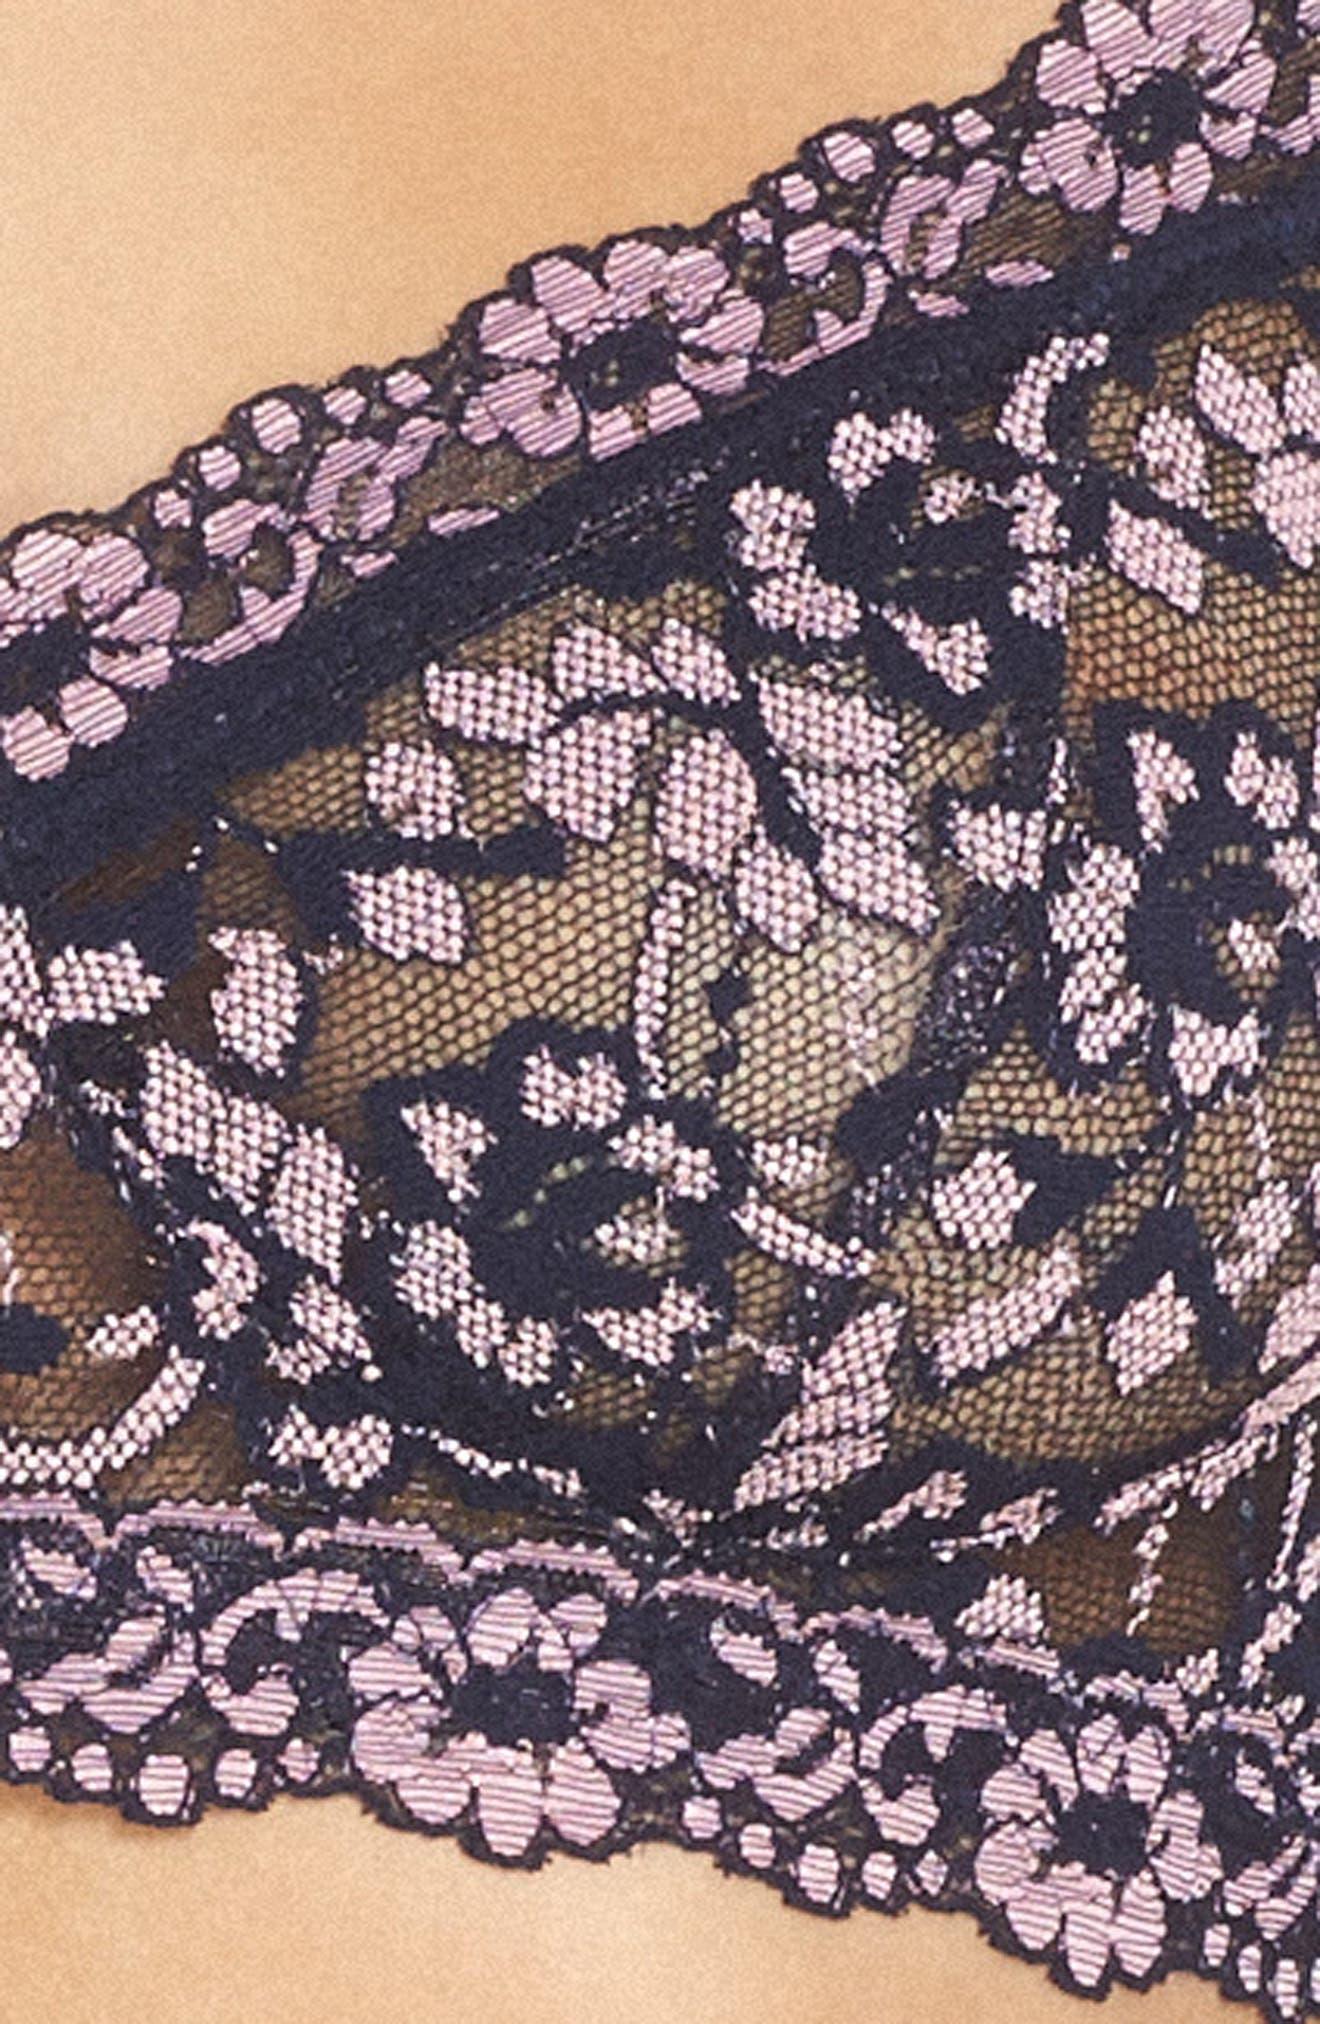 Cross Dye Lace Bralette,                             Alternate thumbnail 12, color,